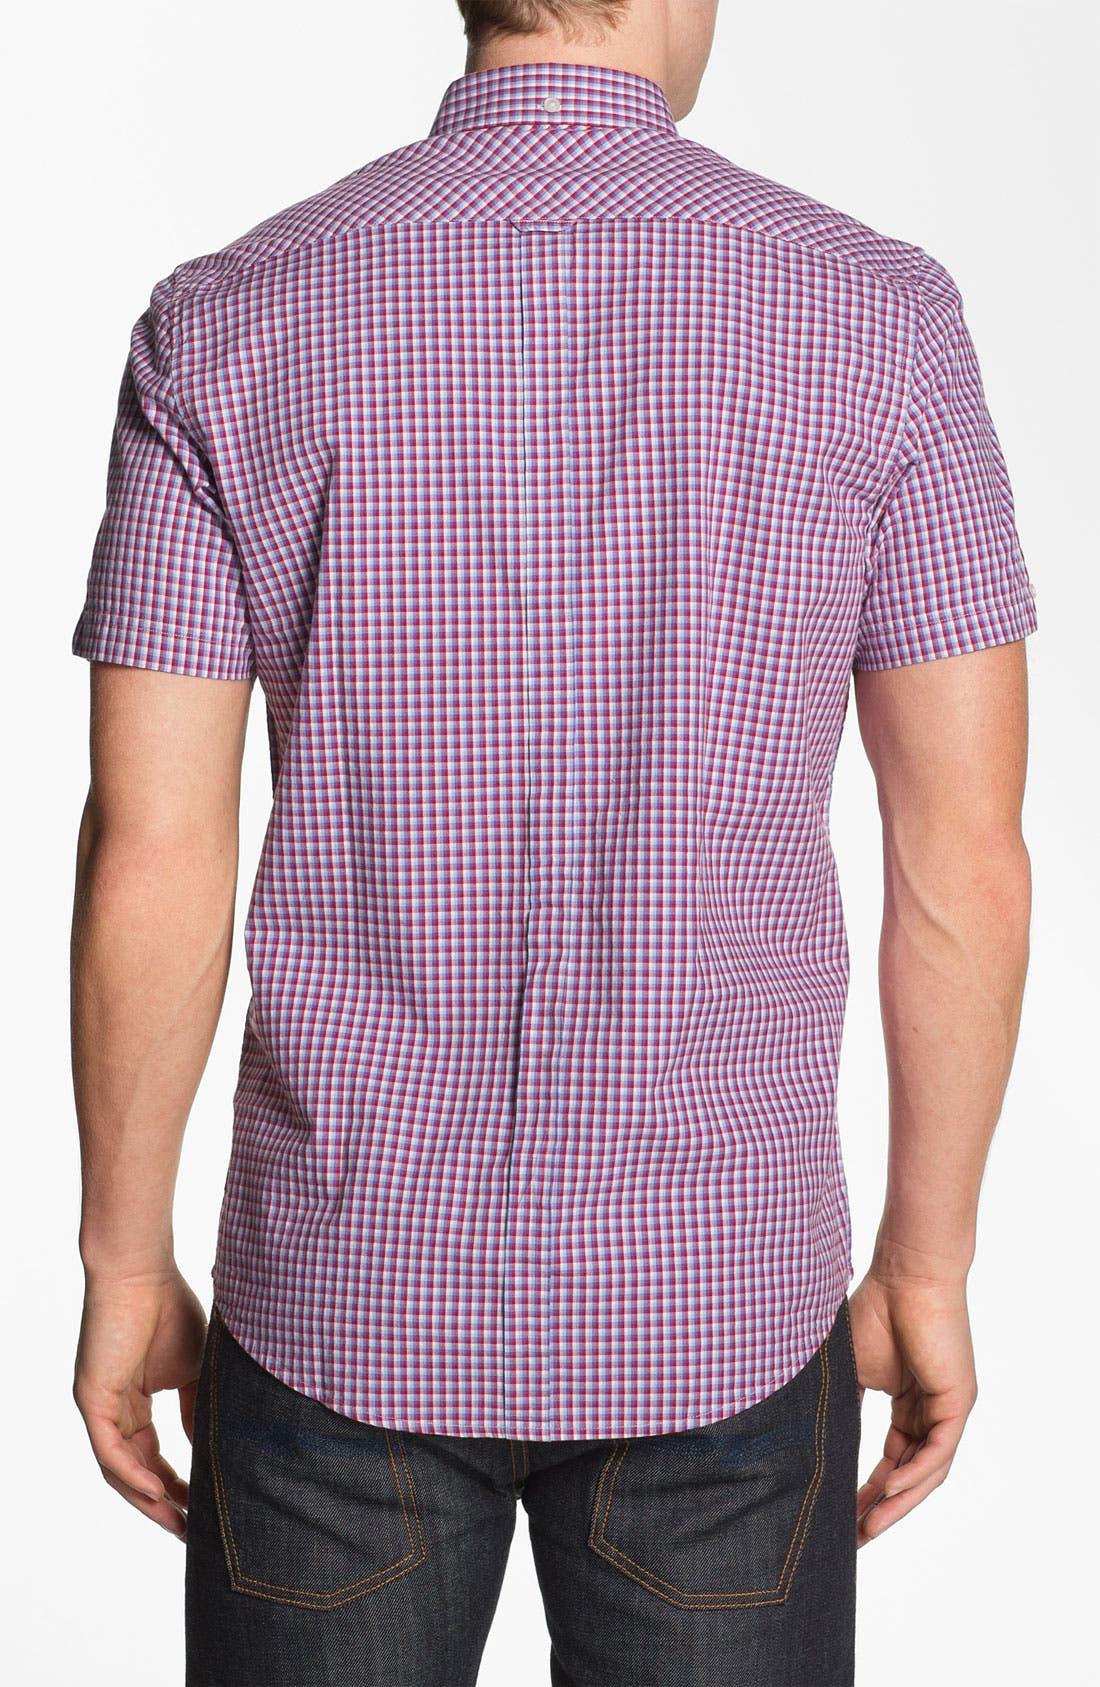 Alternate Image 2  - Ben Sherman Short Sleeve Woven Shirt